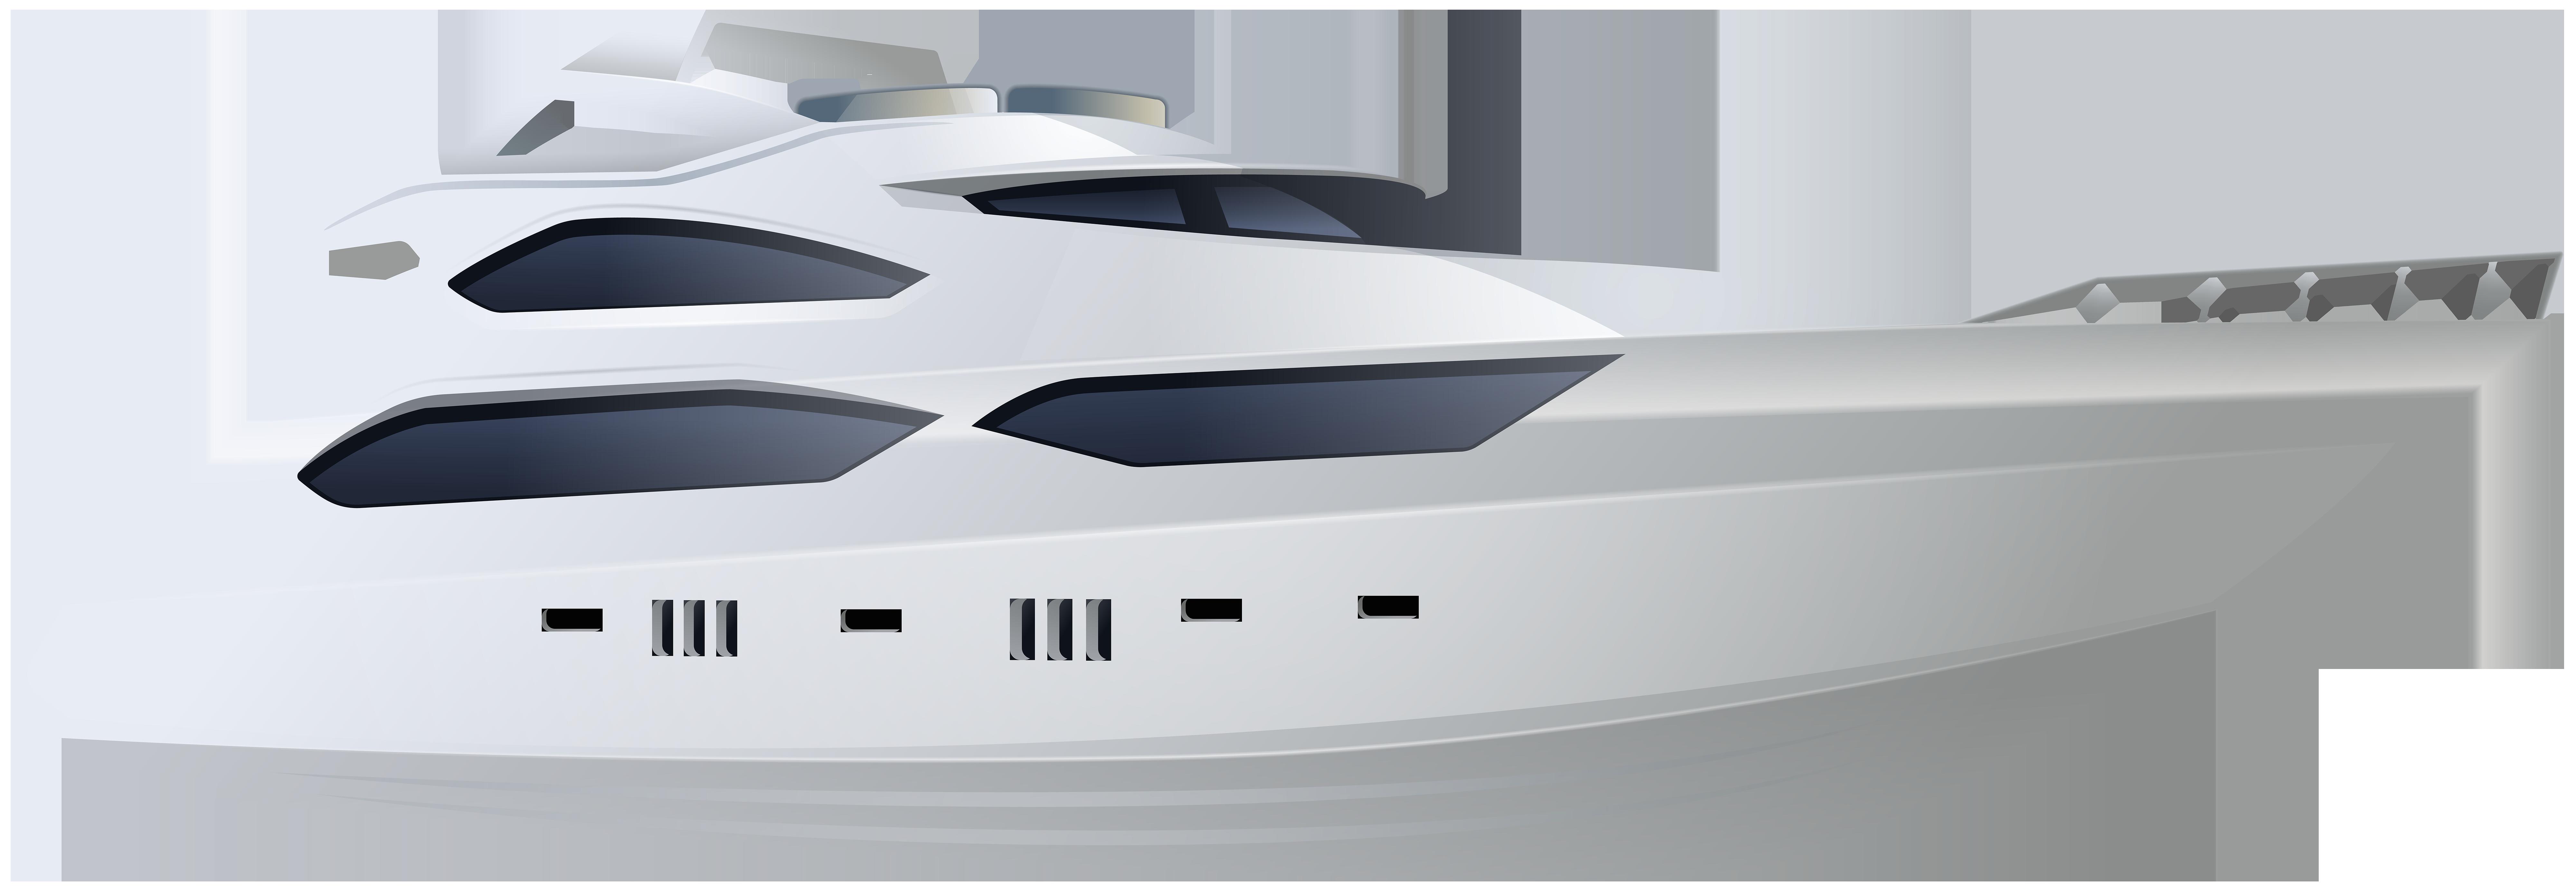 Yacht PNG Clip Art Image.